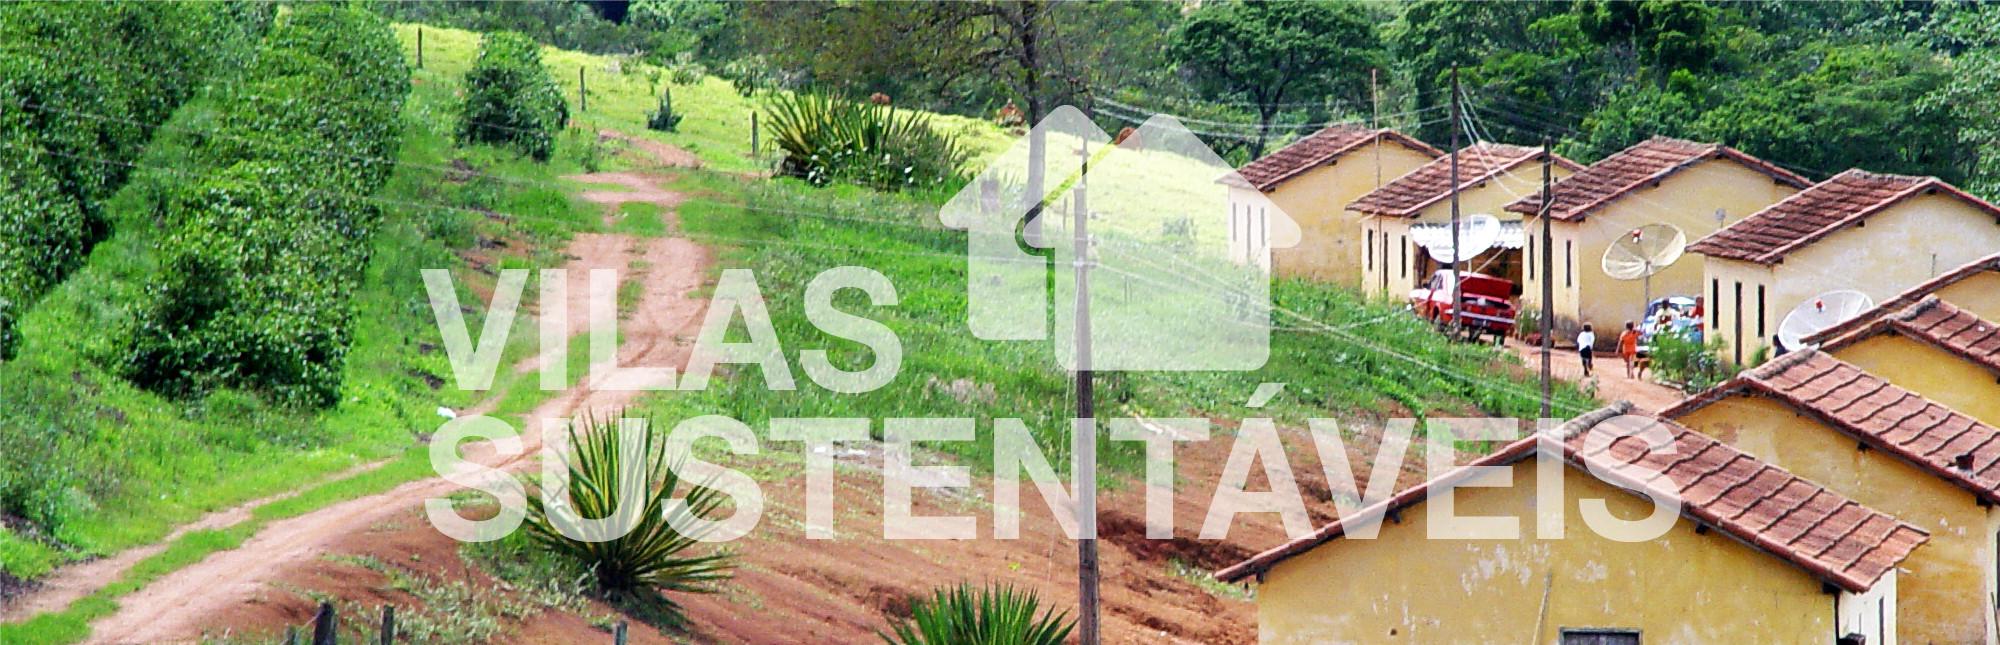 villa_brasil_projetos-e1399053949267